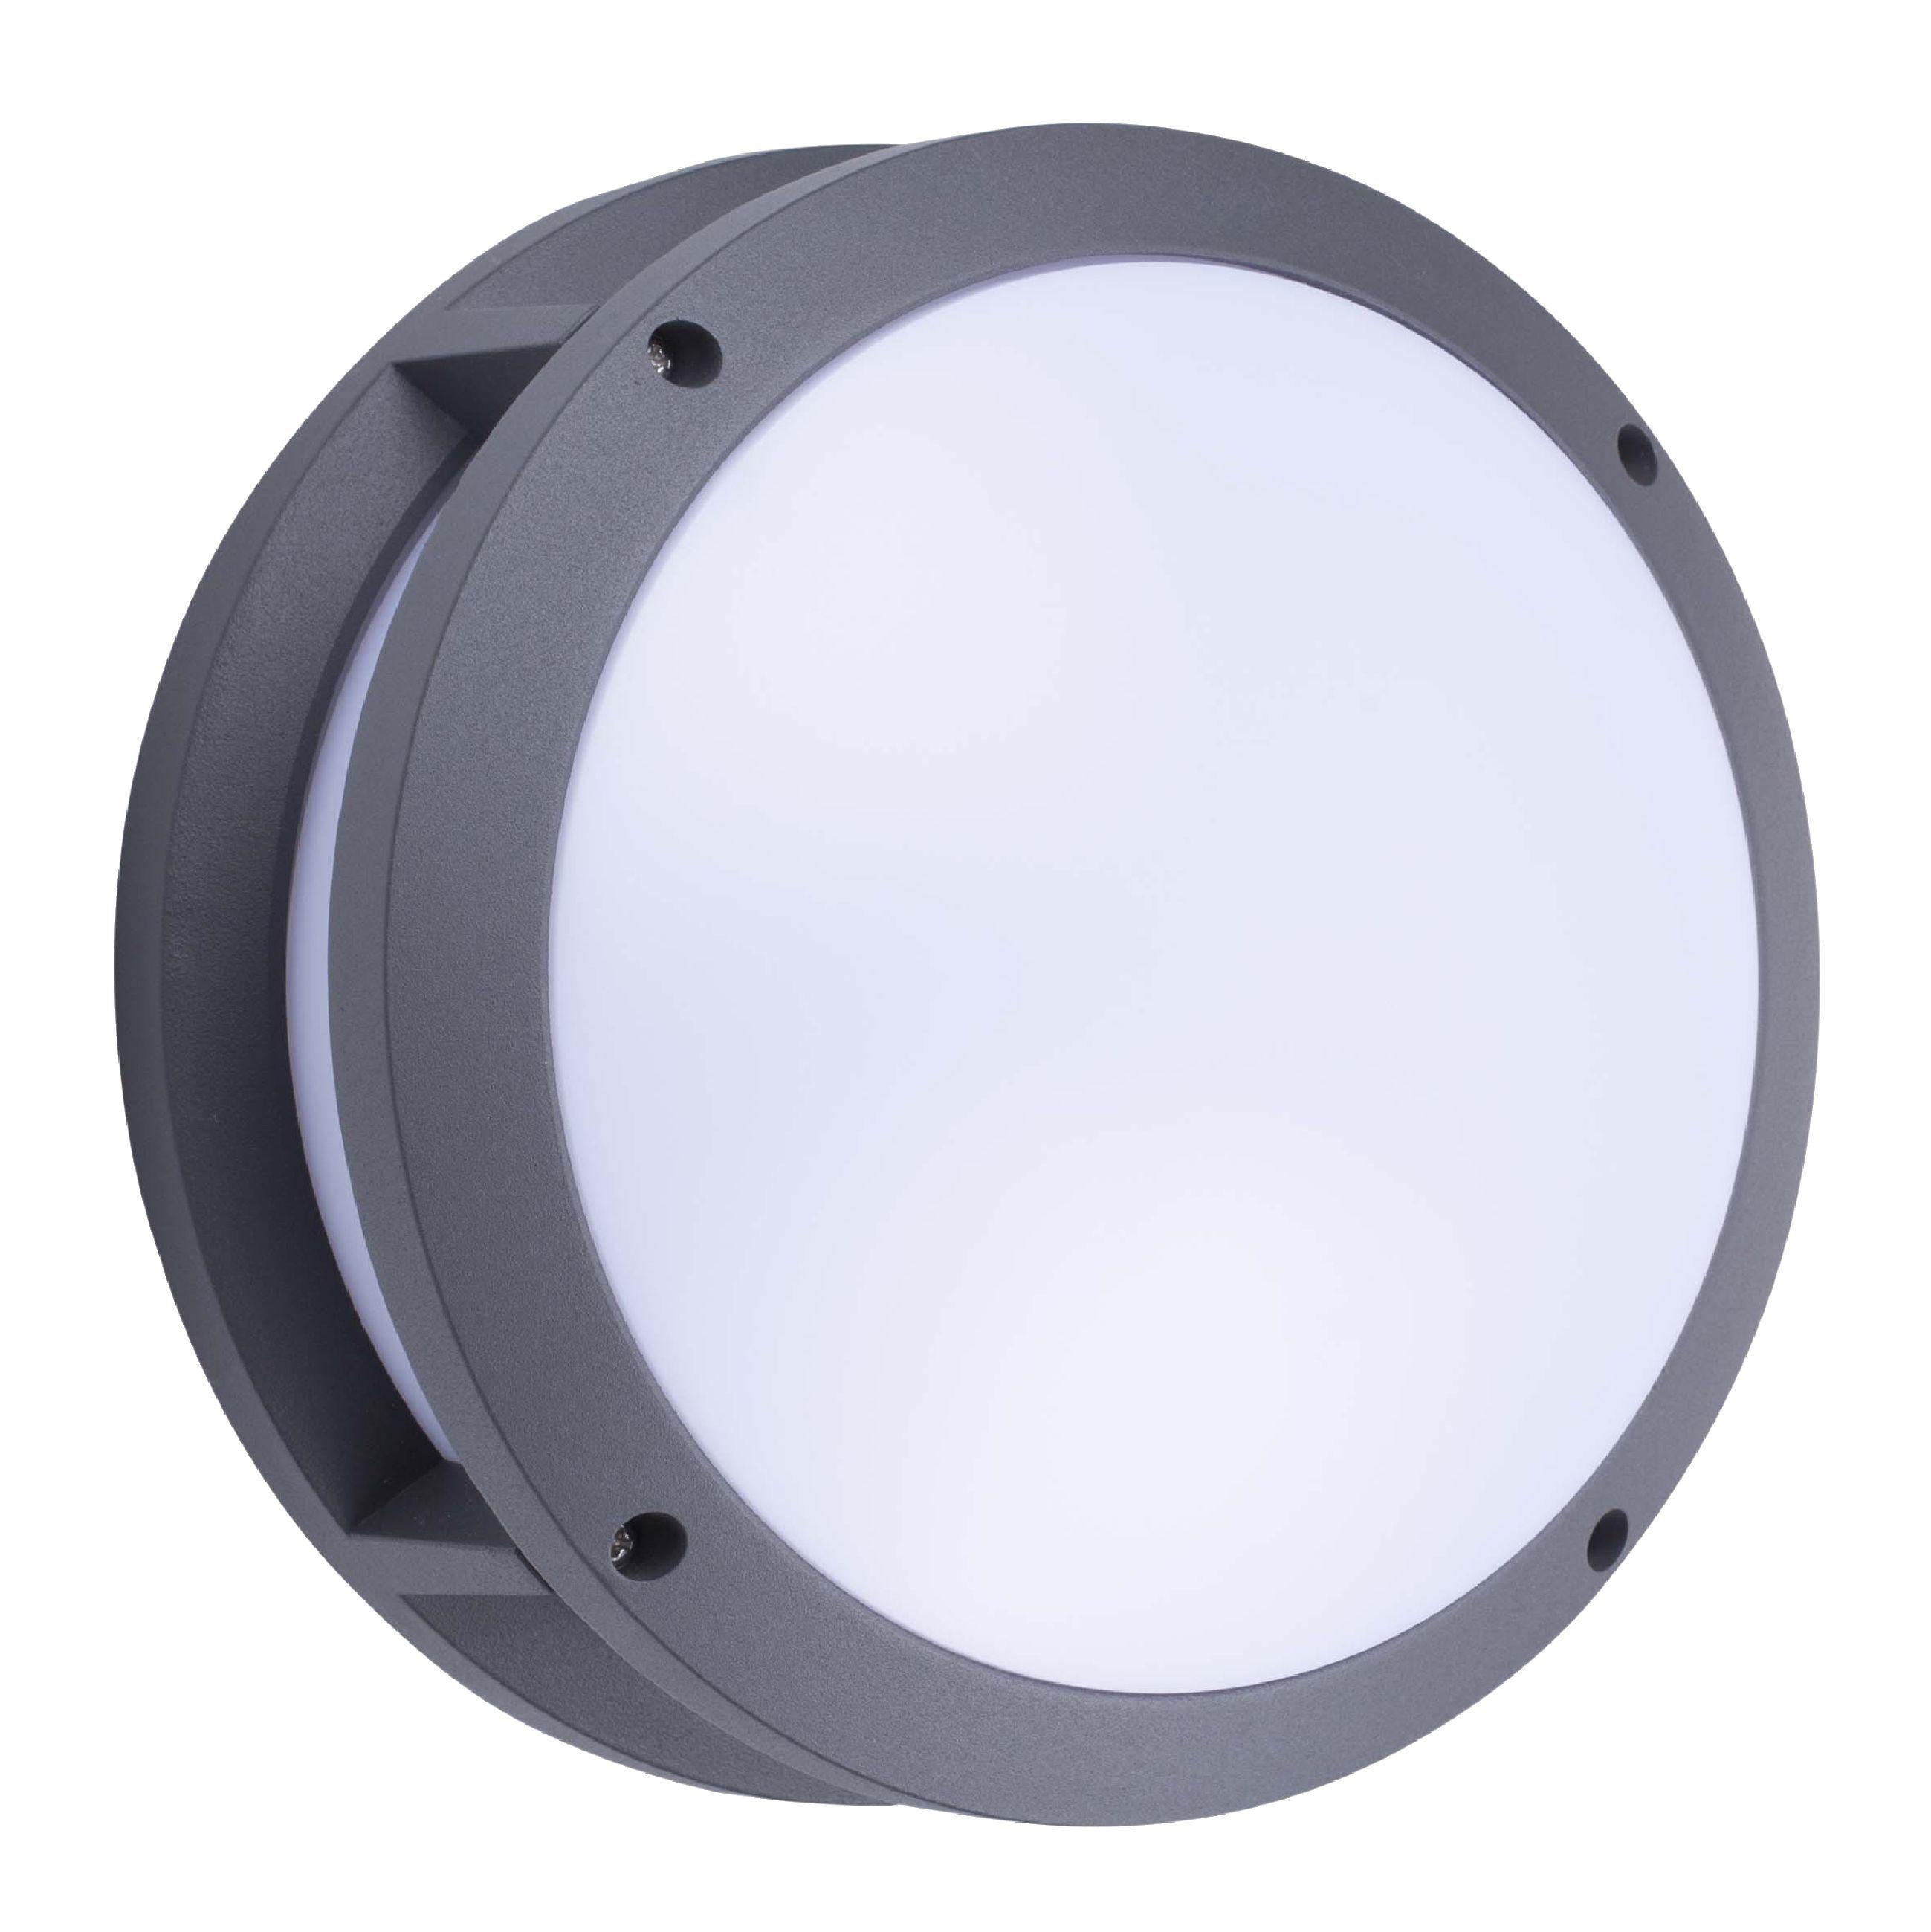 GWL-001-HS LUZ EXTERIOR LED